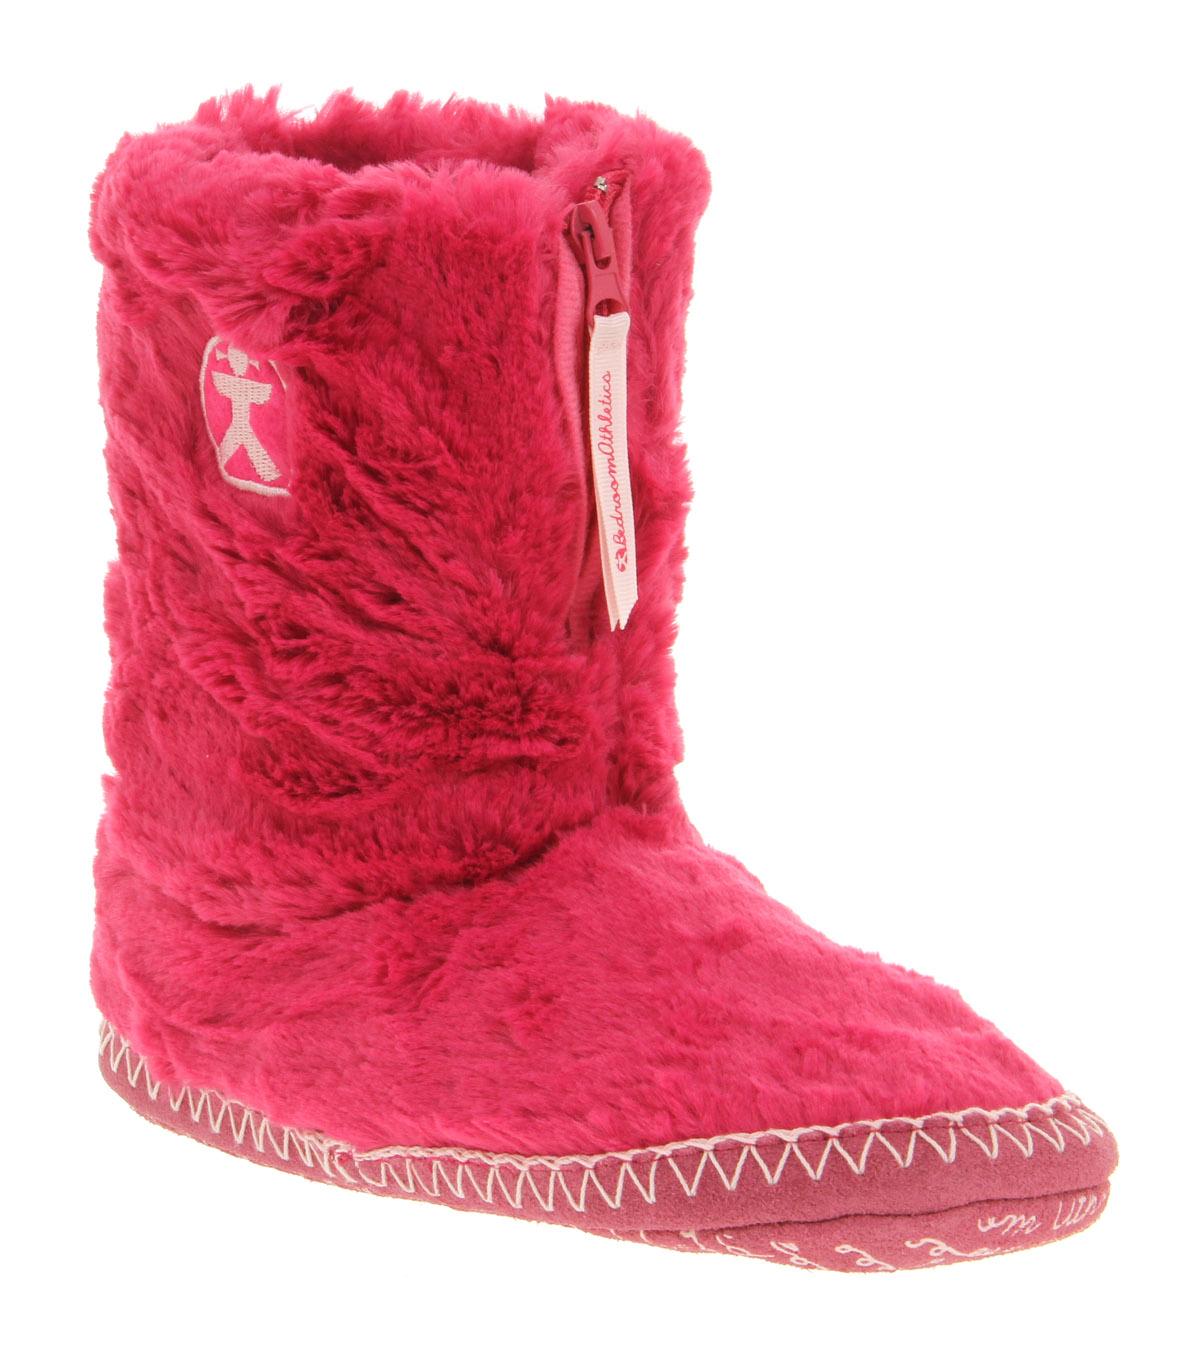 Womens Bedroom Athletics Marilyn Iii Slipper Boot Hot Pink Boots